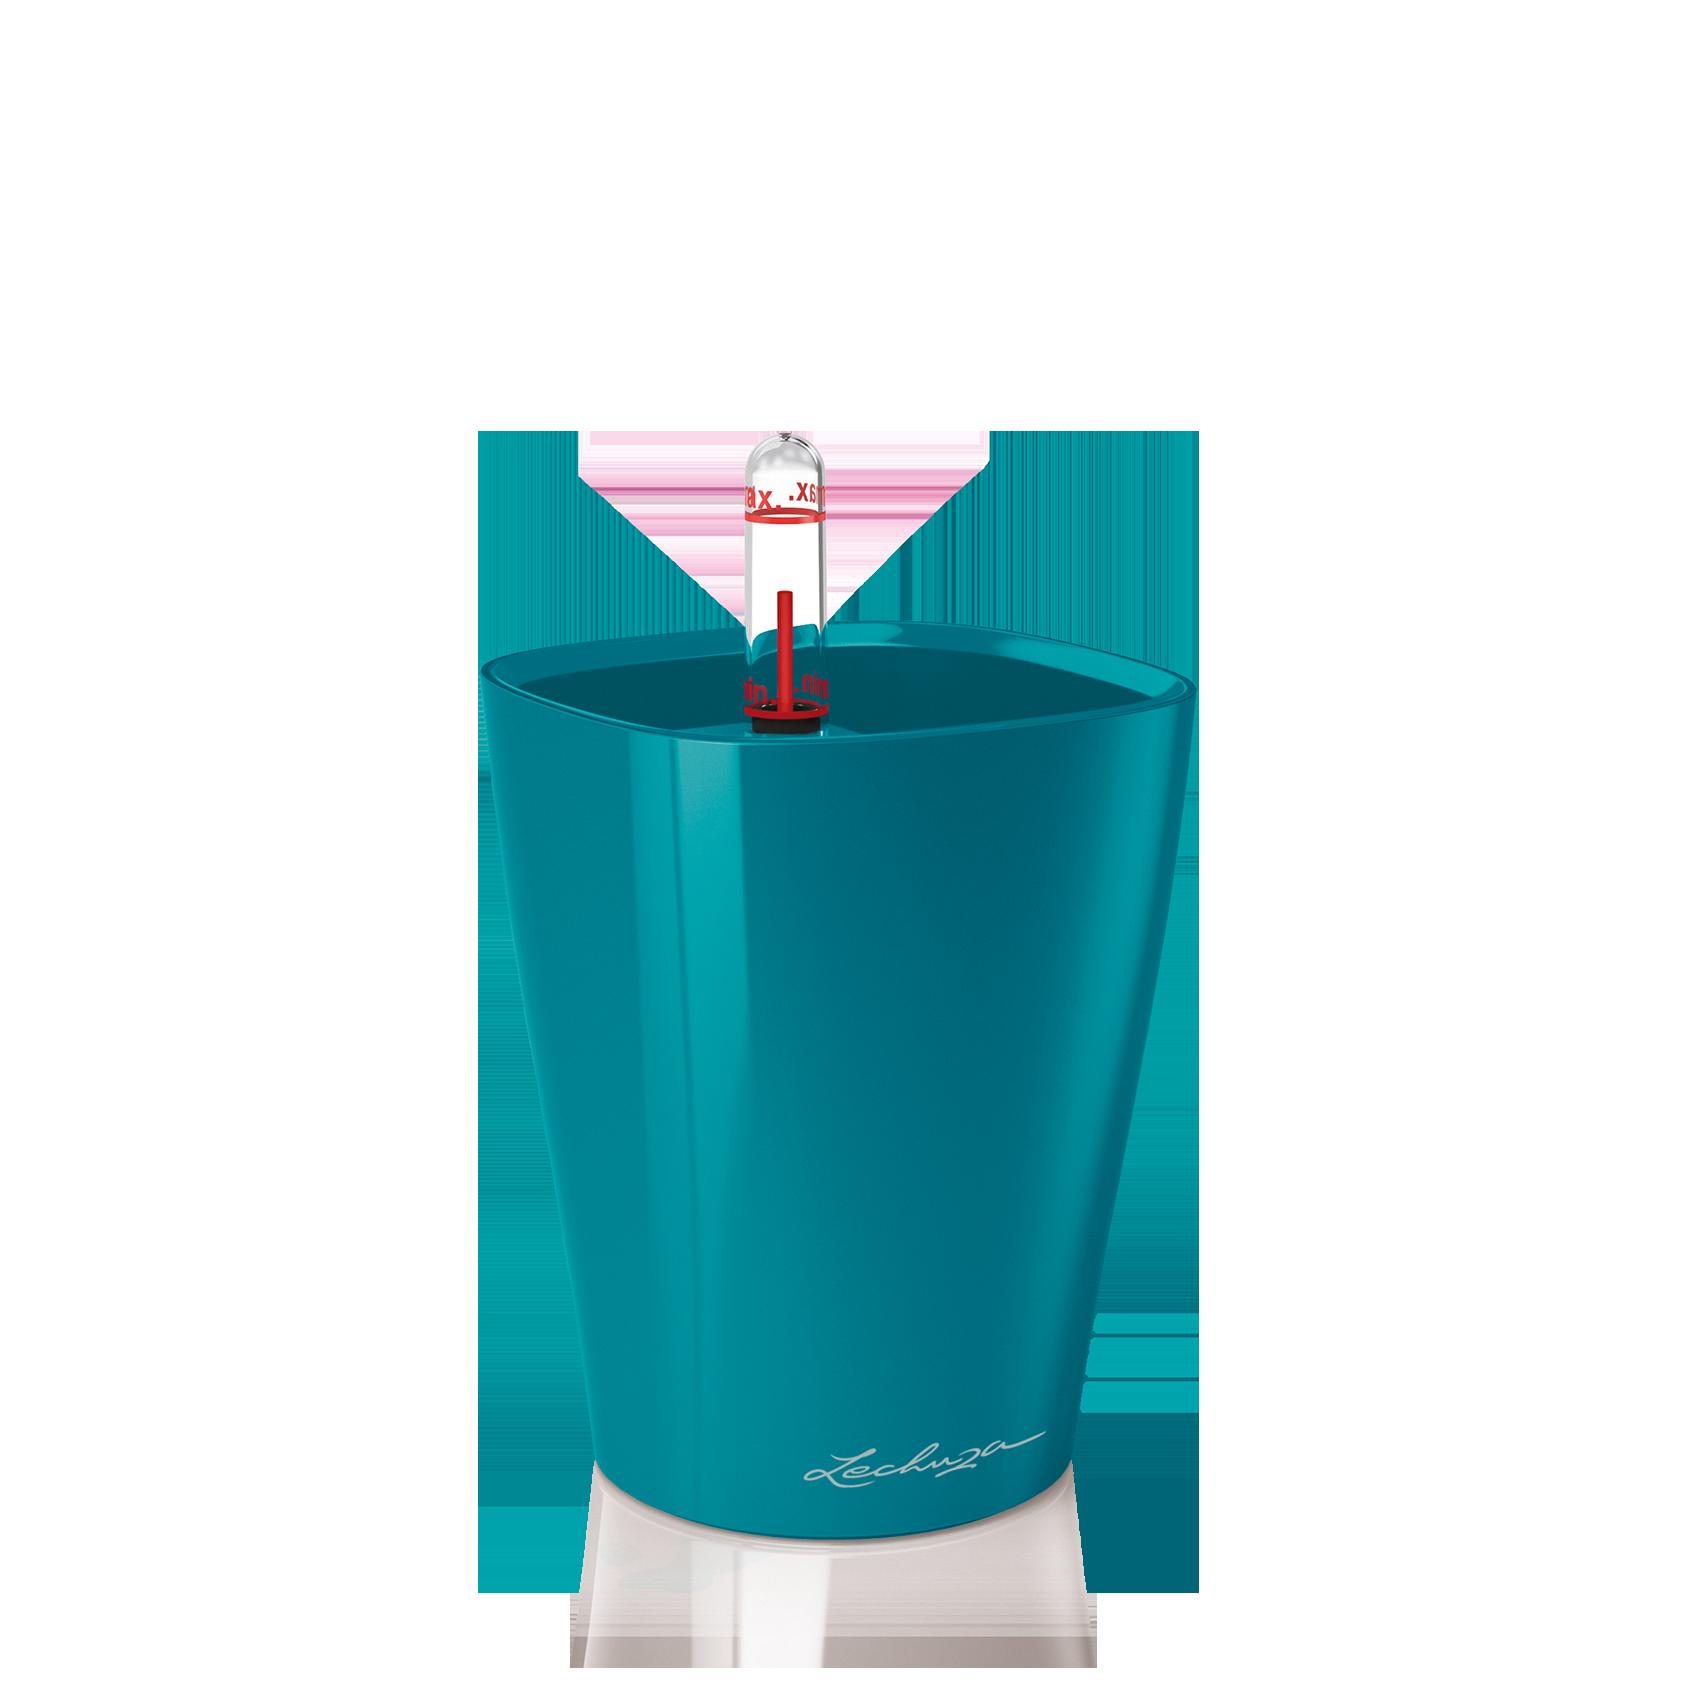 MINI-DELTINI bleu paon brillant